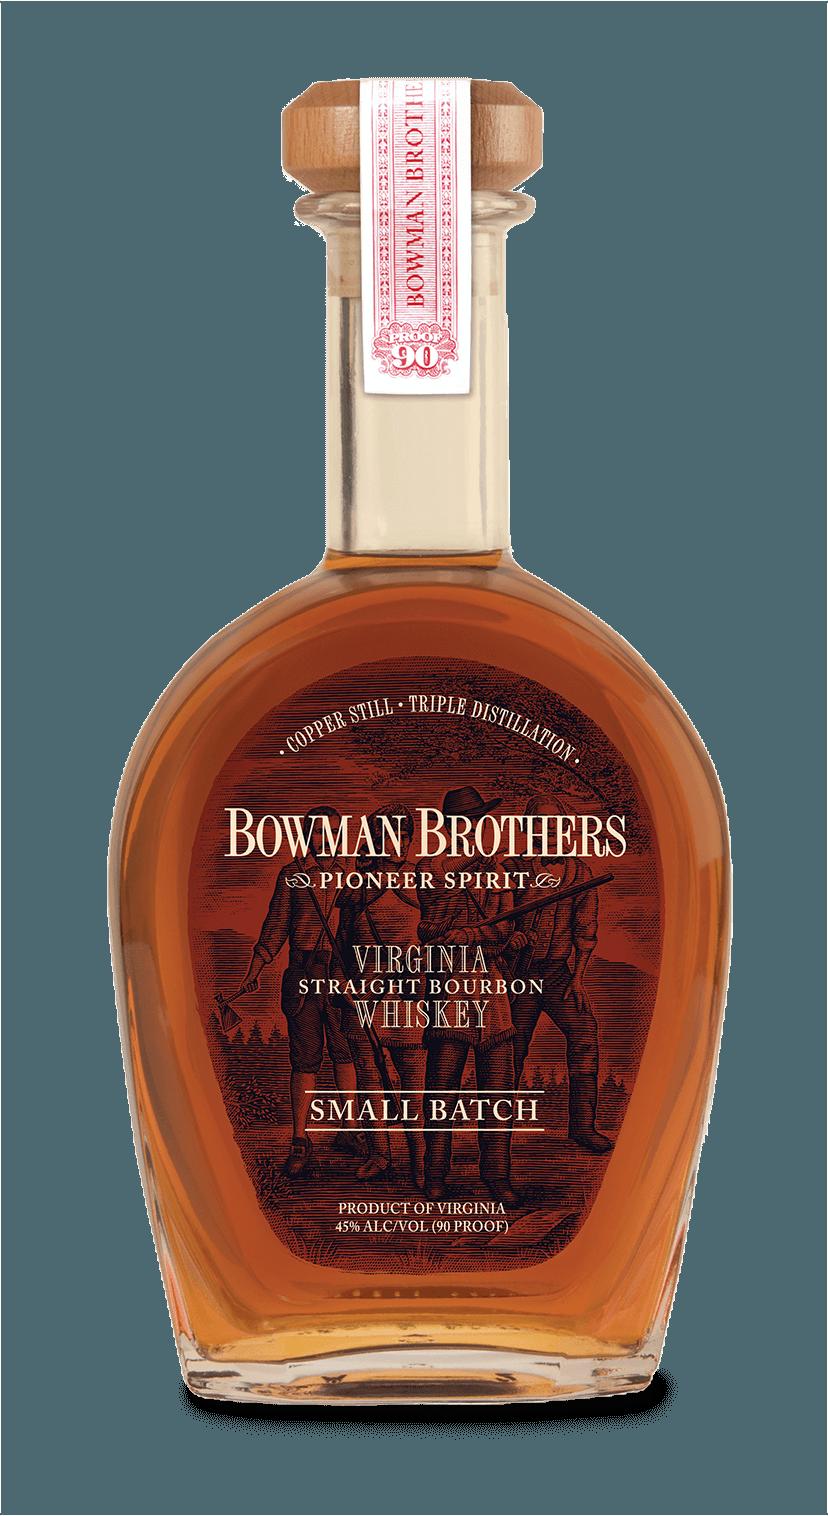 Bowman Brothers Bourbon Small Batch 750ml